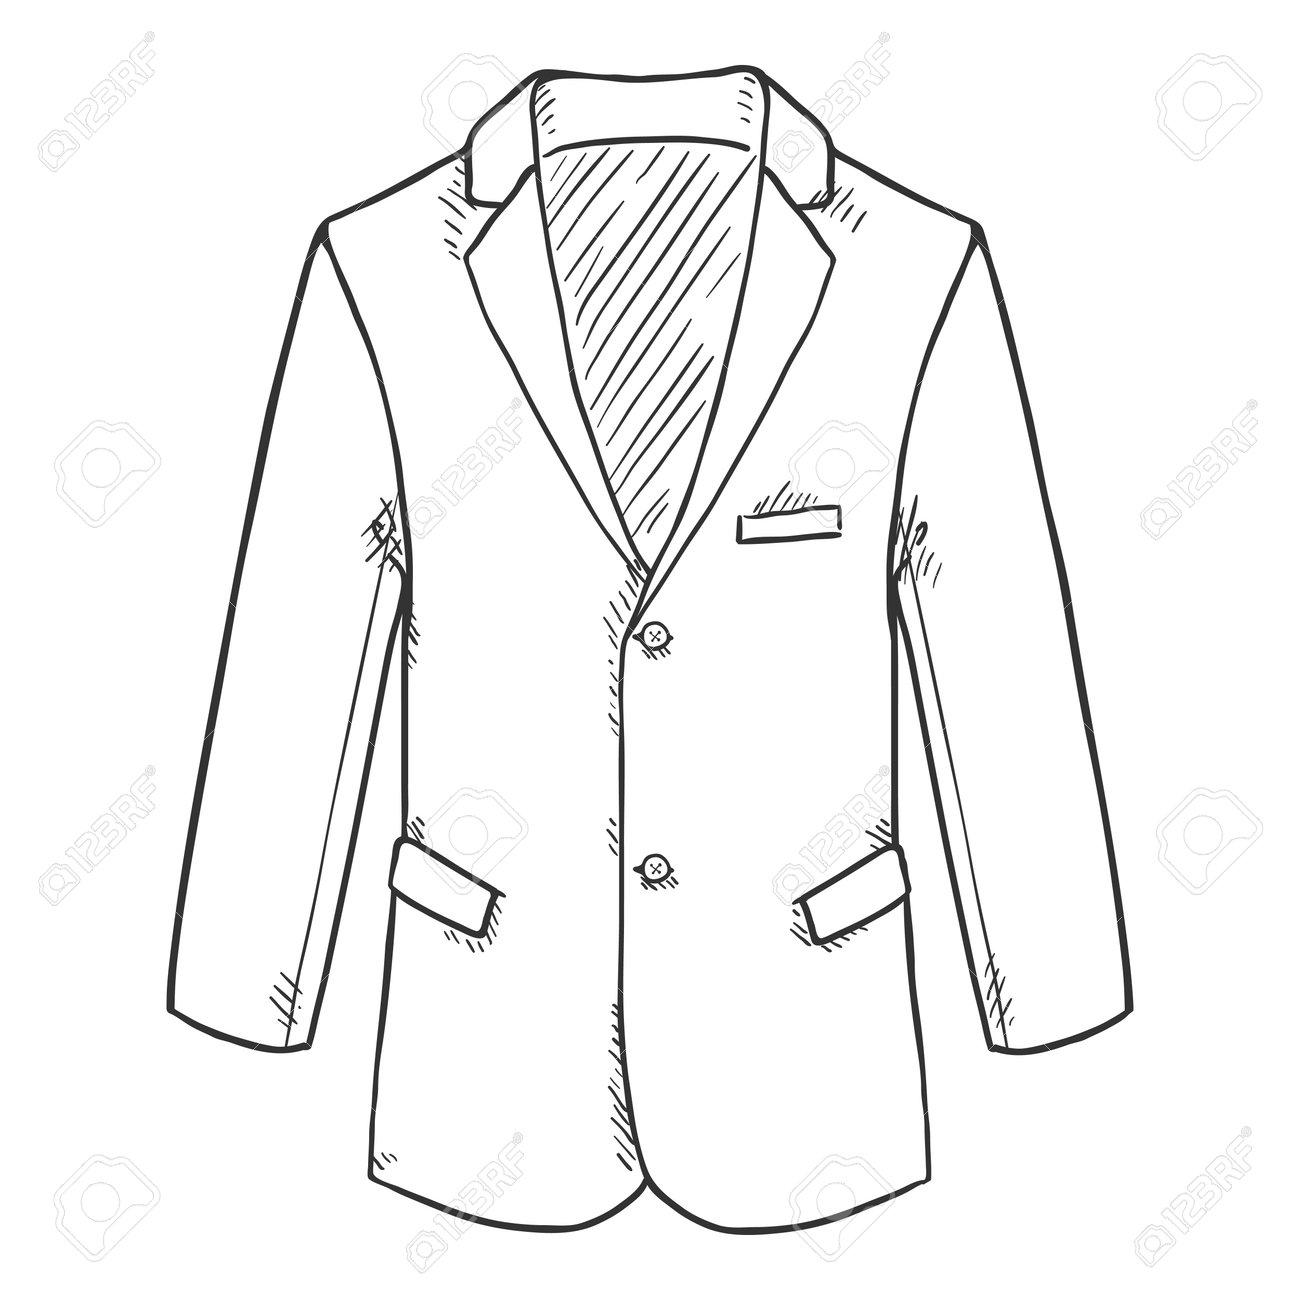 Sketch Blazer. Suit Jacket Vector Hand Drawn Illustration. - 169663656